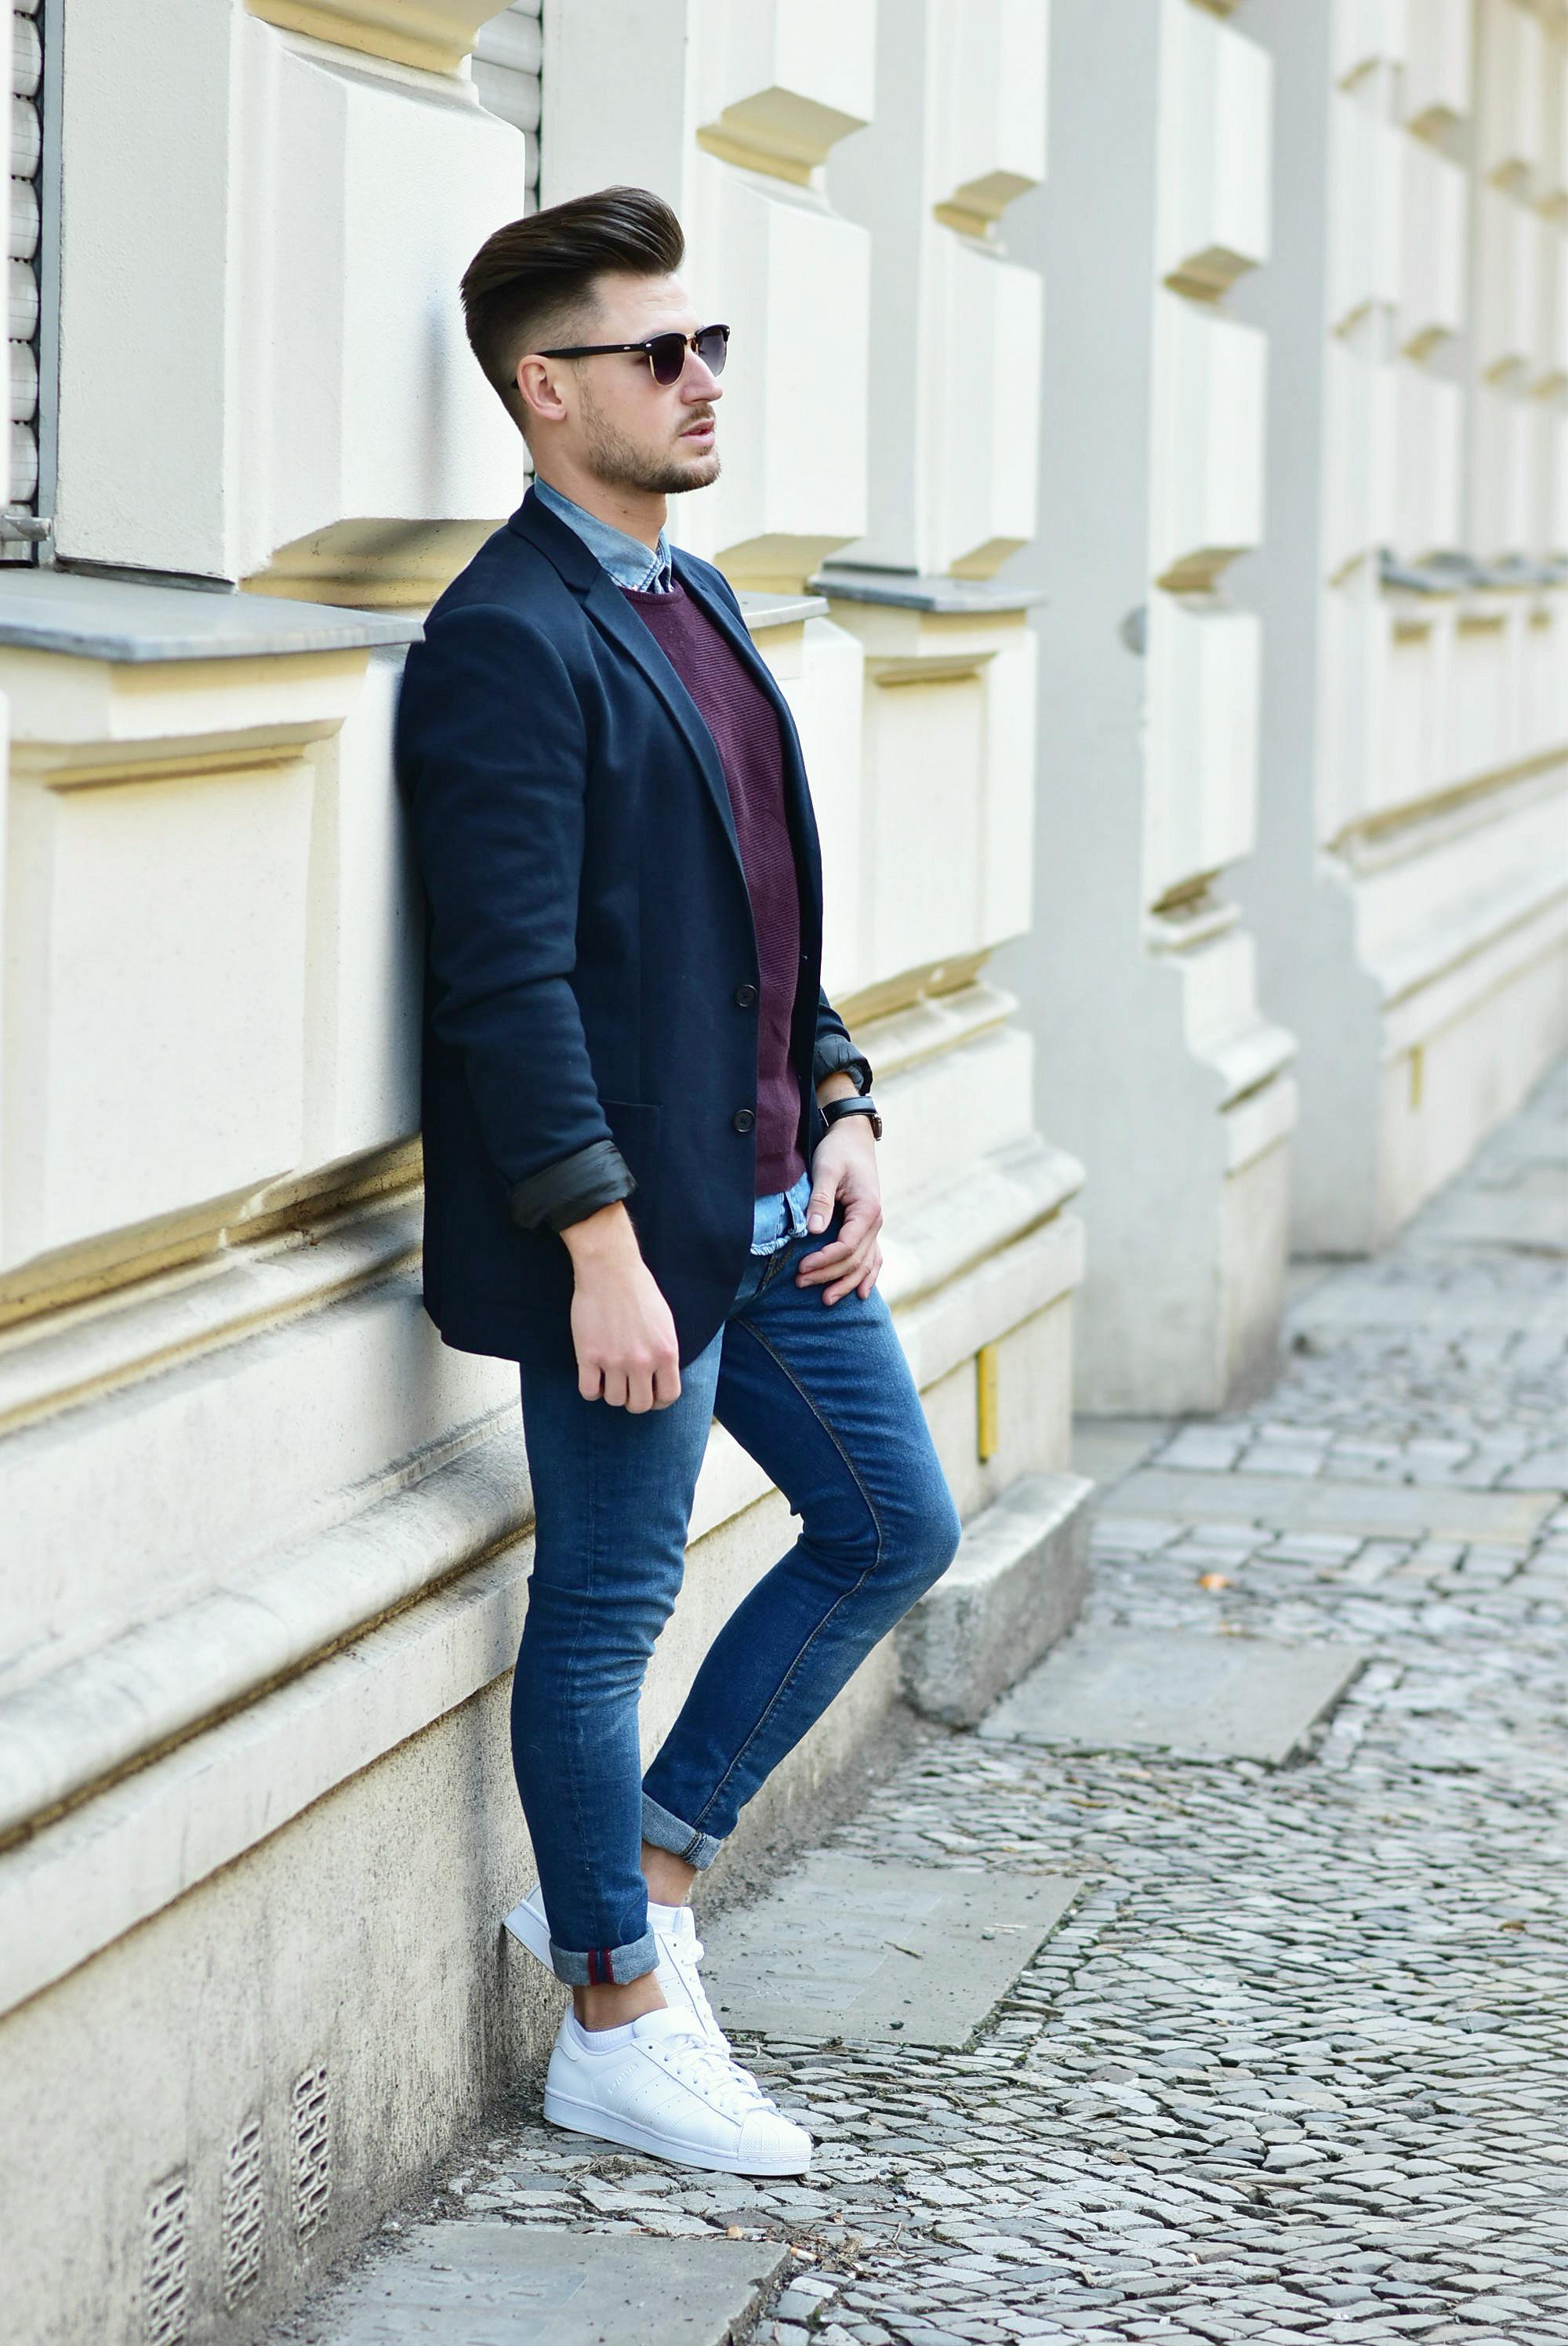 Tommeezjerry-Styleblog-Männerblog-Männer-Modeblog-Berlin-Berlinblog-Outfit-Streetlook-Skinny-Jeans-Roter-Sweater-Sonnenbrille-Jeanshemd-Adidas-Superstar-Blazer-Smart-Look-Denim-Look